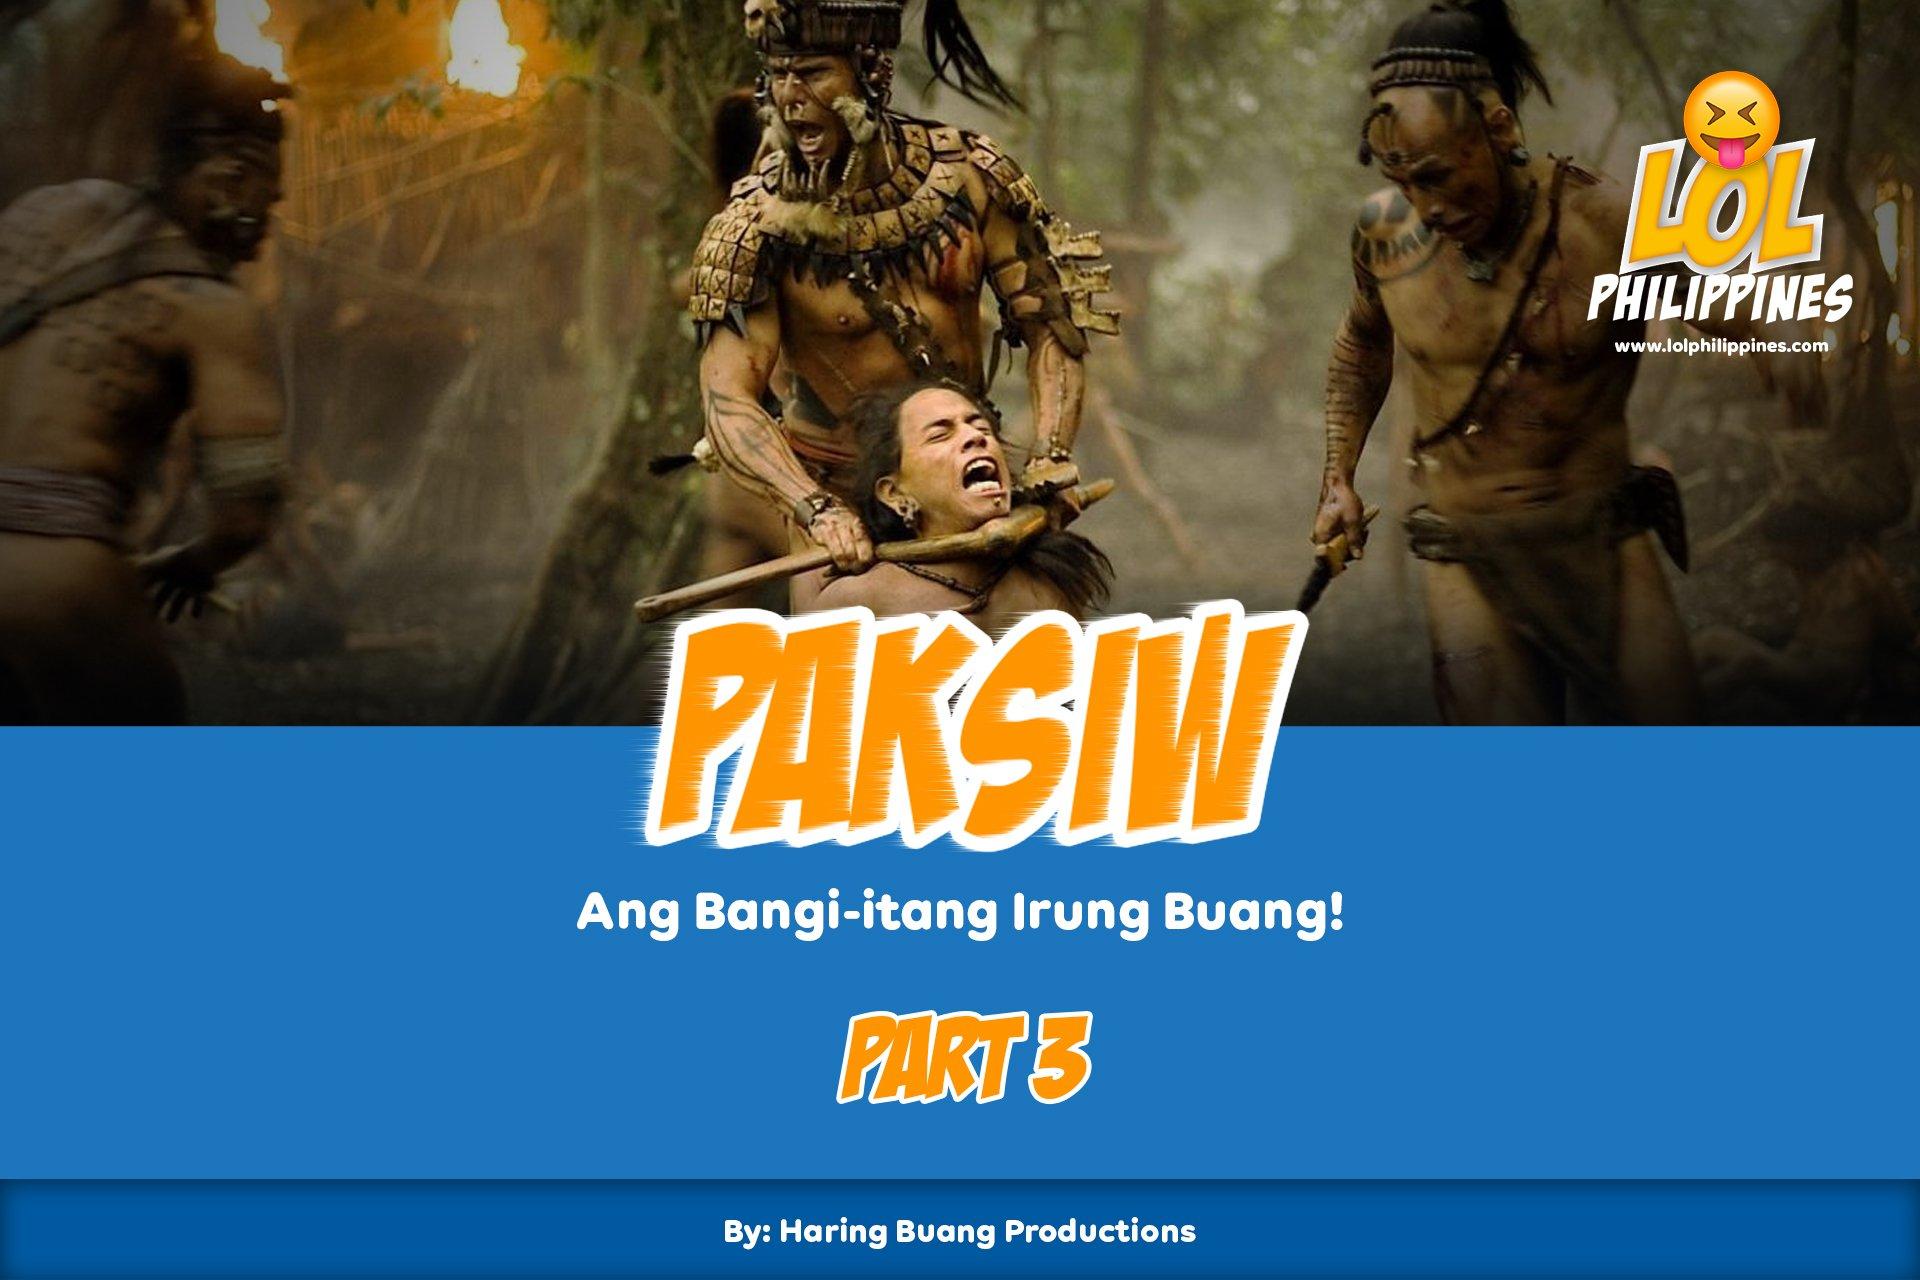 LOL Philippines Paksiw Part 3